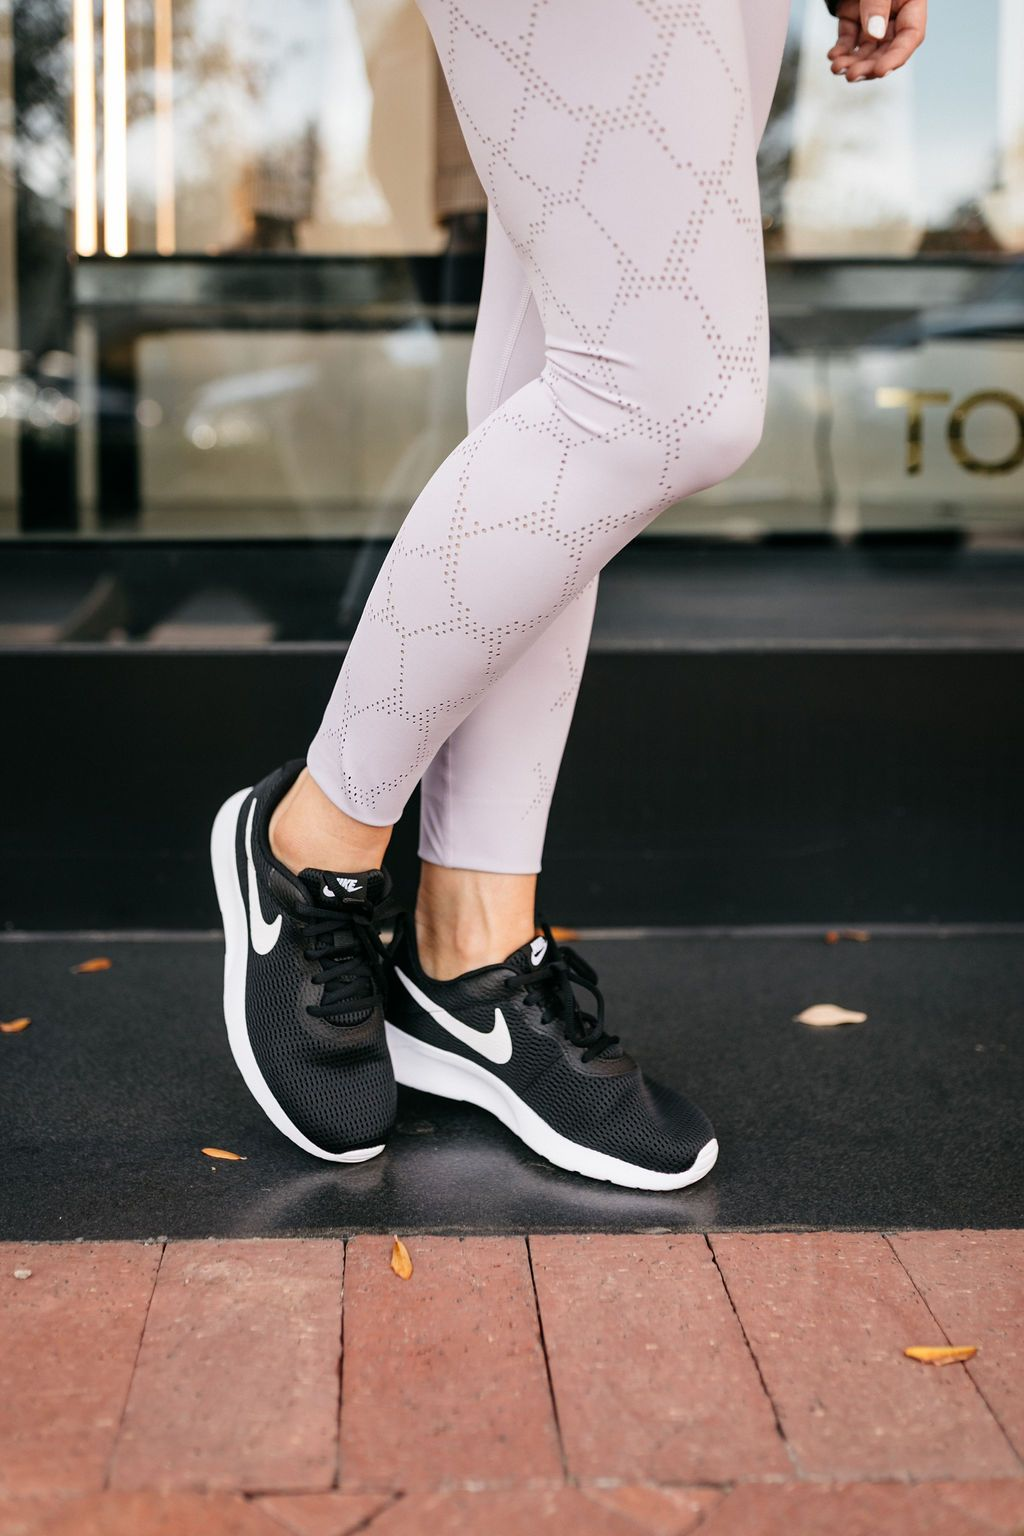 Sneakers looks, Black nikes, Nike shoes